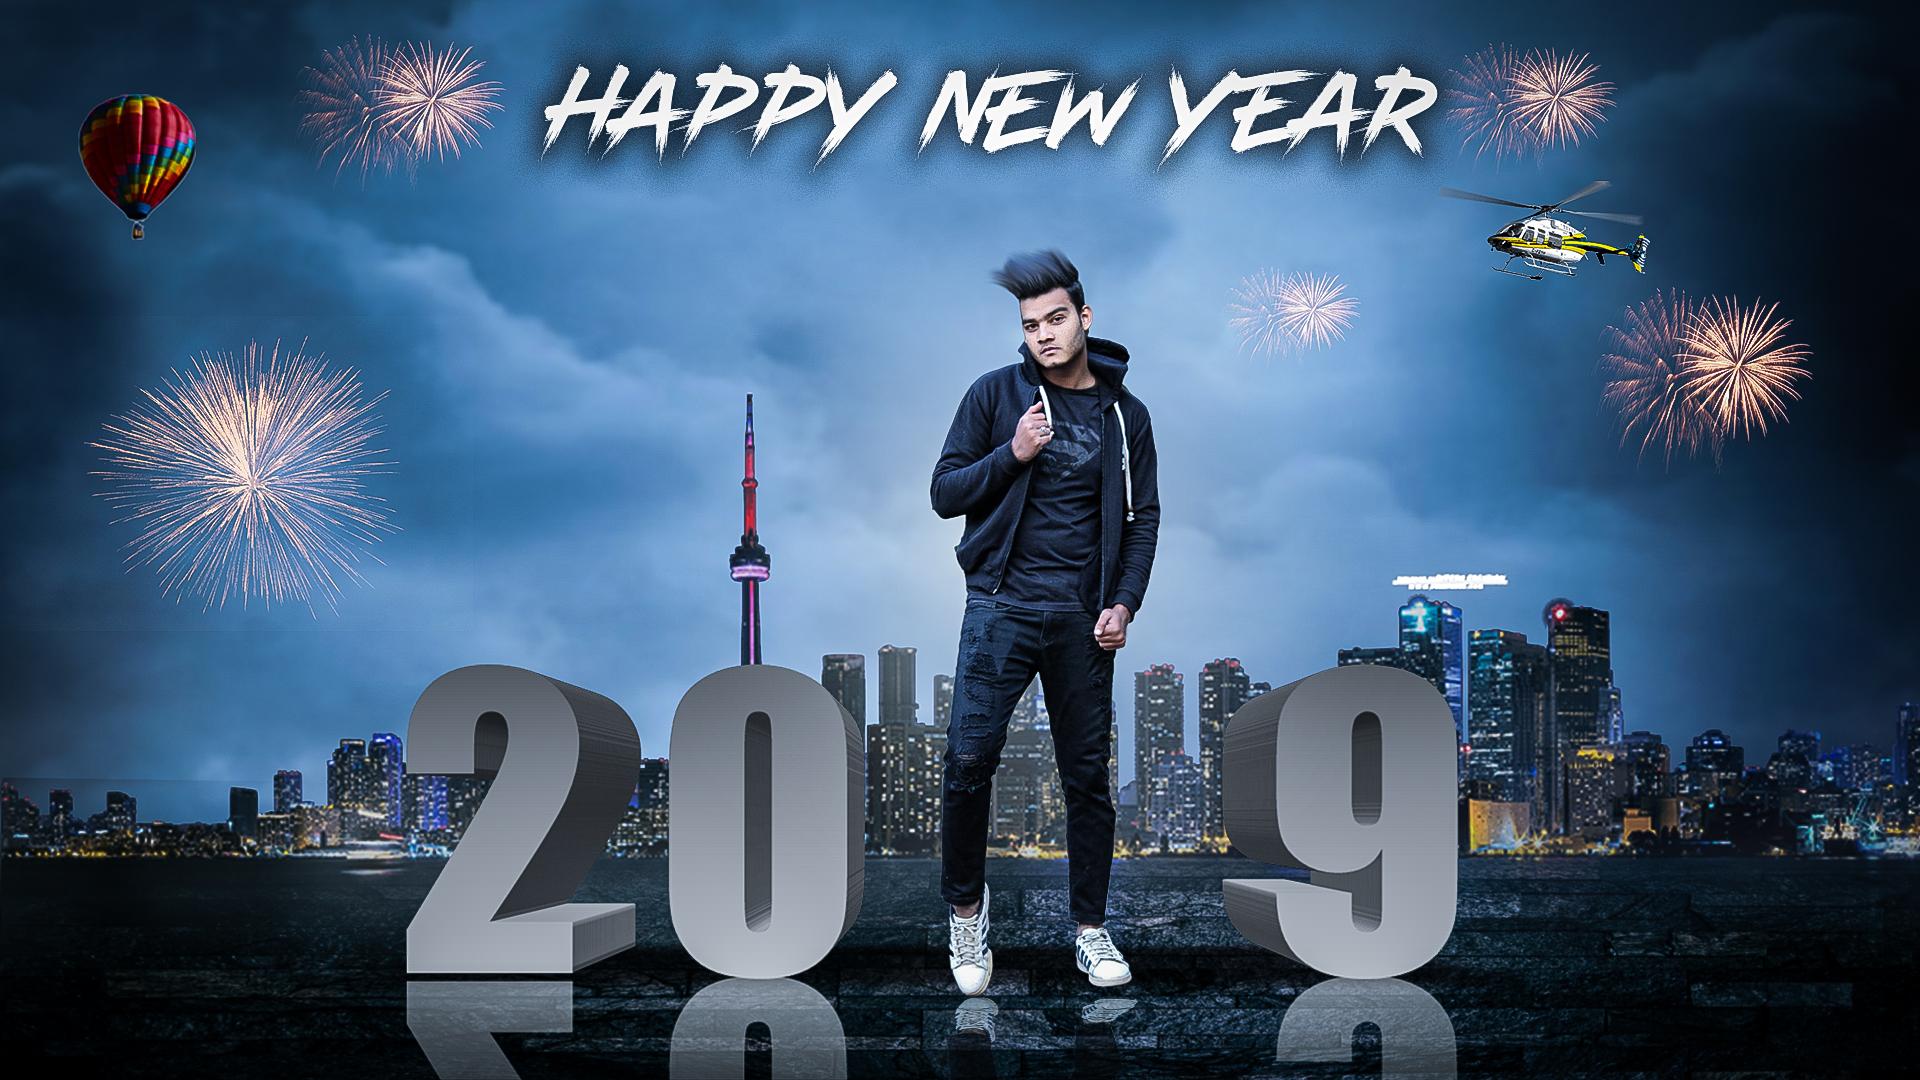 Happy New Year 2019 Photo Editing Background Download - Happy New Year 2019 Editing , HD Wallpaper & Backgrounds